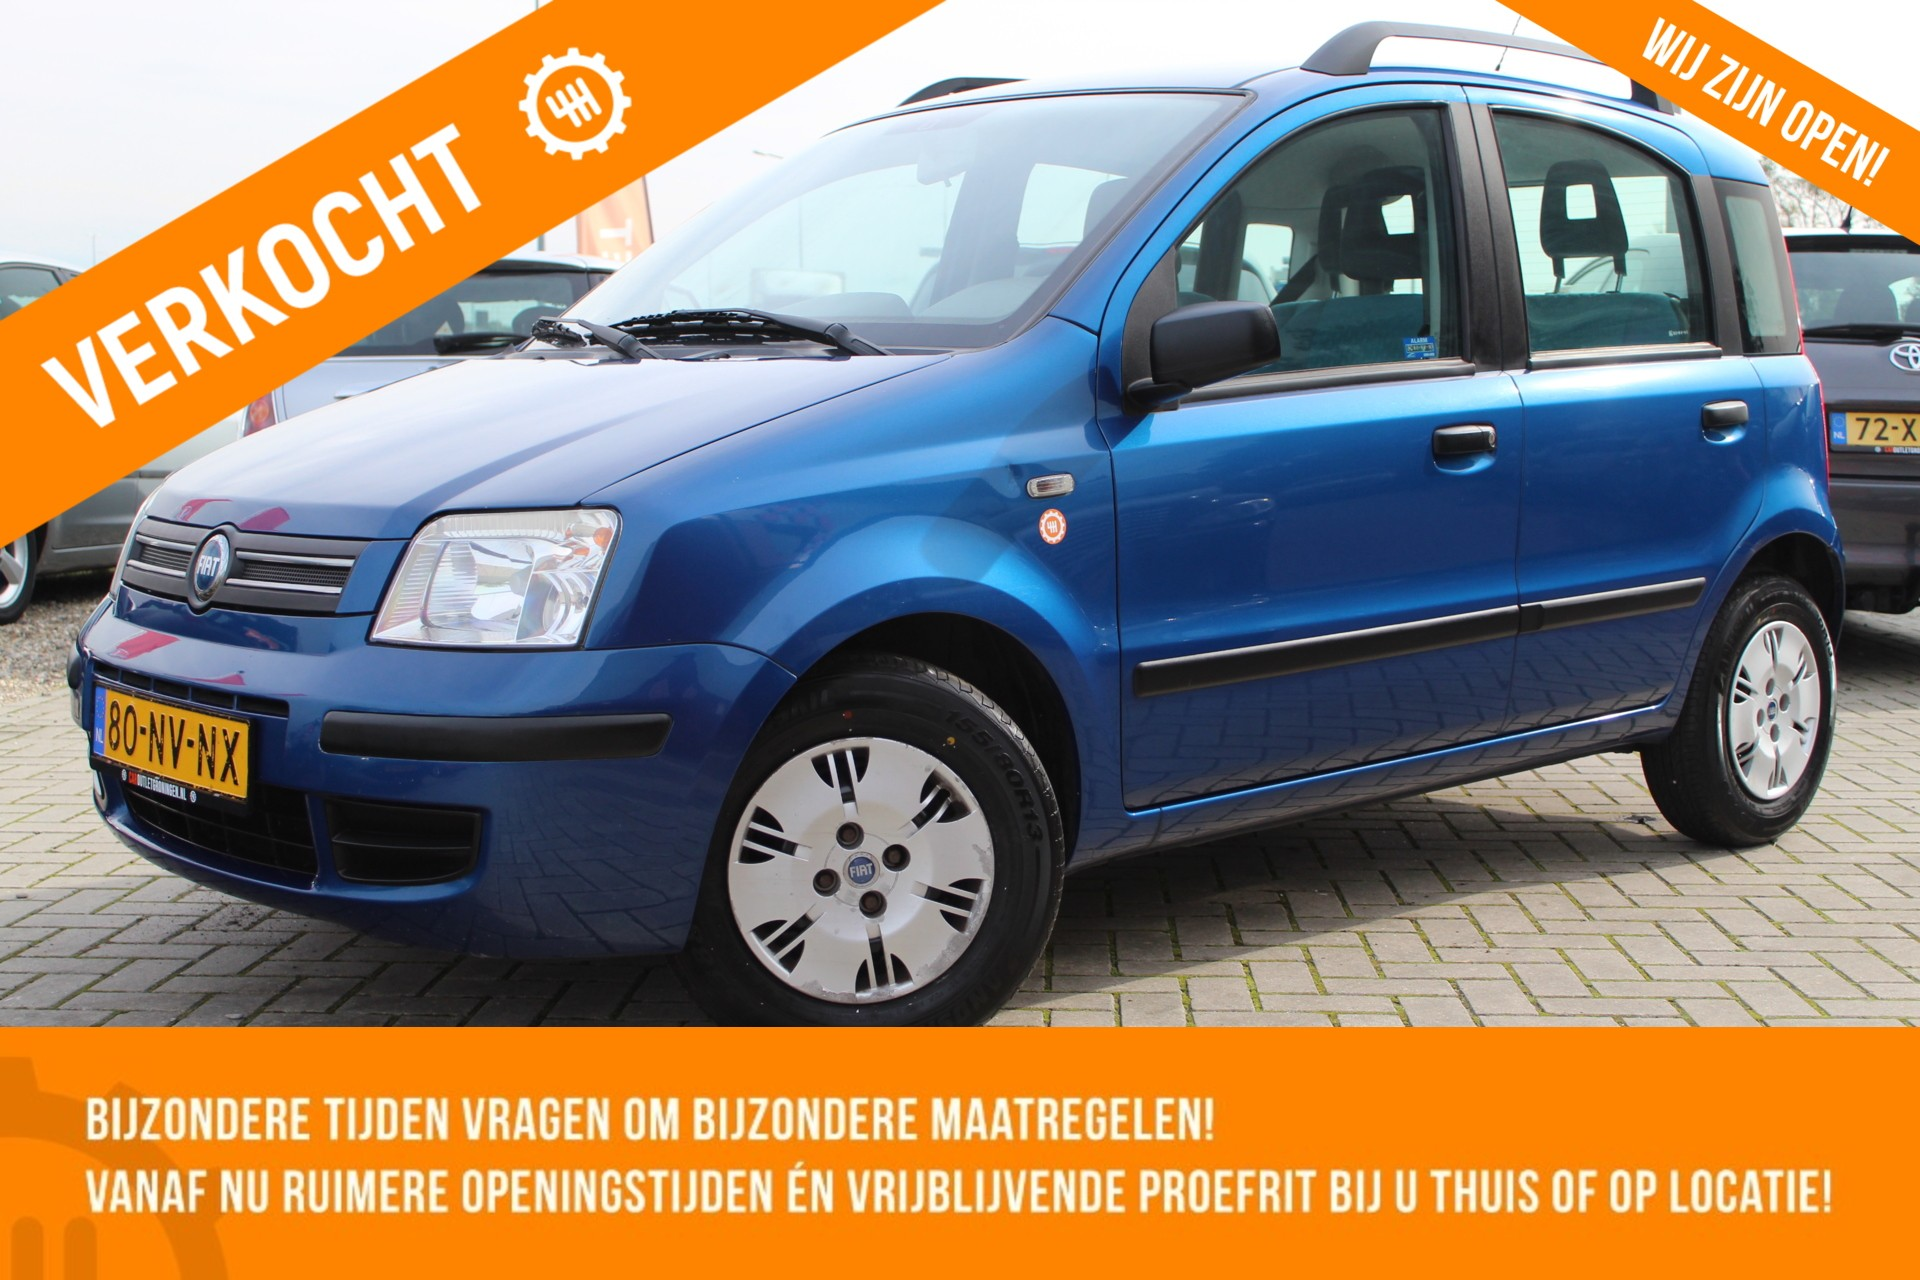 Caroutlet Groningen - Fiat Panda 1.2 Dynamic | ELEK PAKKET | NW APK | 5 DEURS